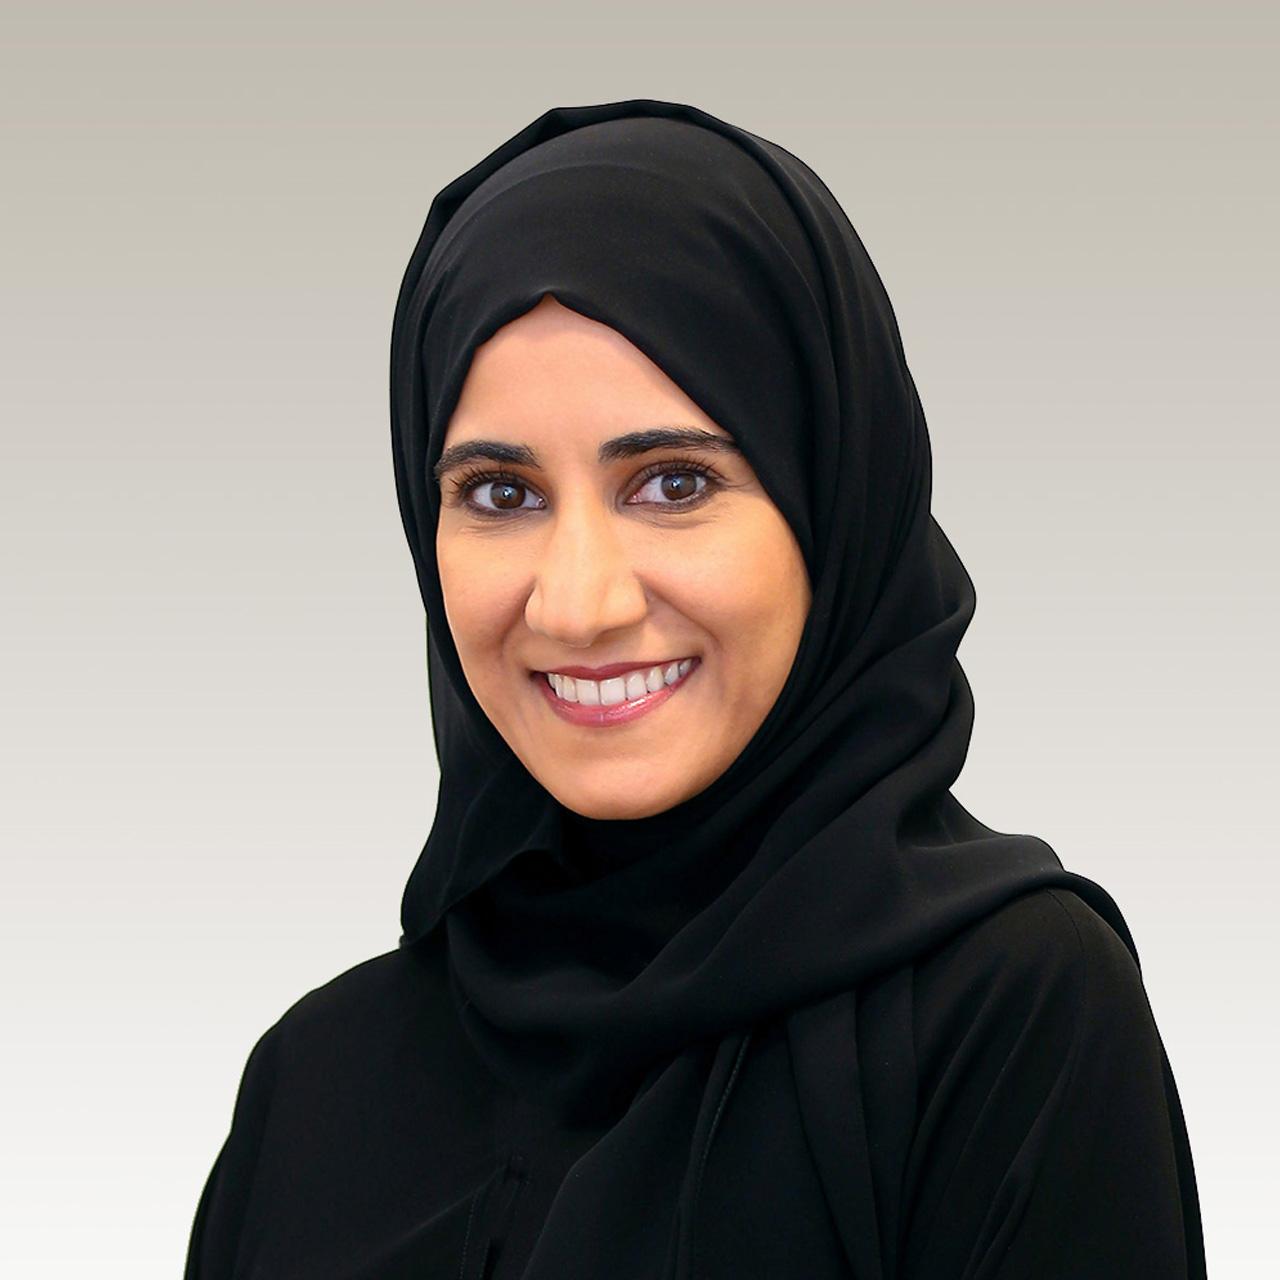 Hayfa Al-Abdulla